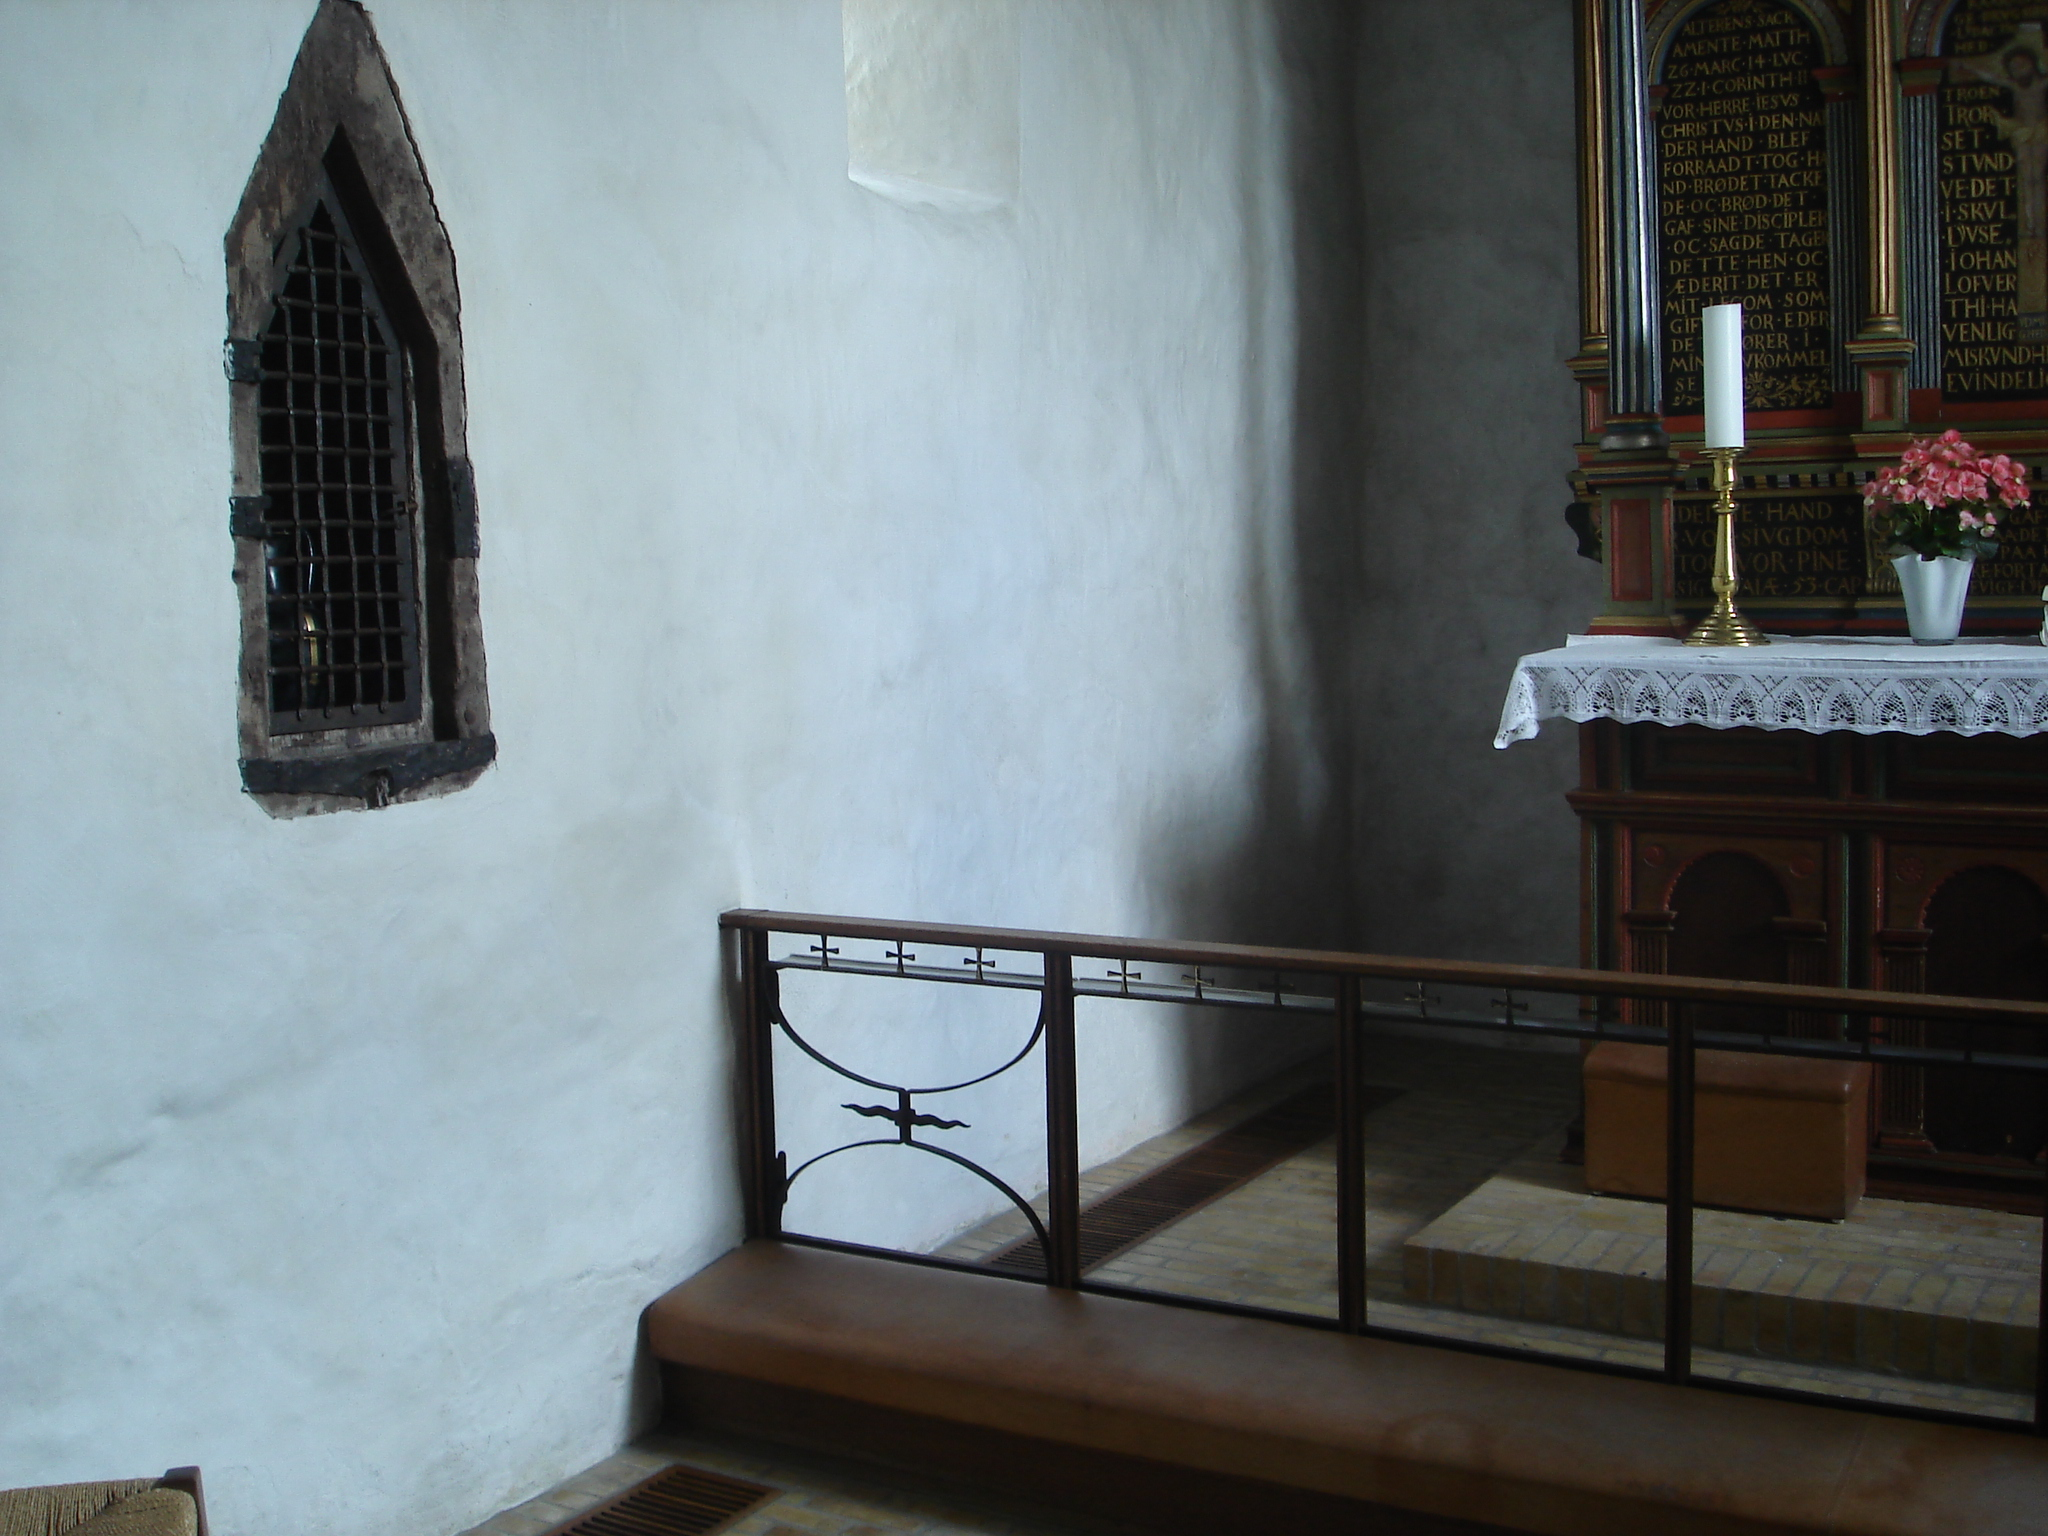 DSC05831 Lågen til kollektskovlen Rud Kirke